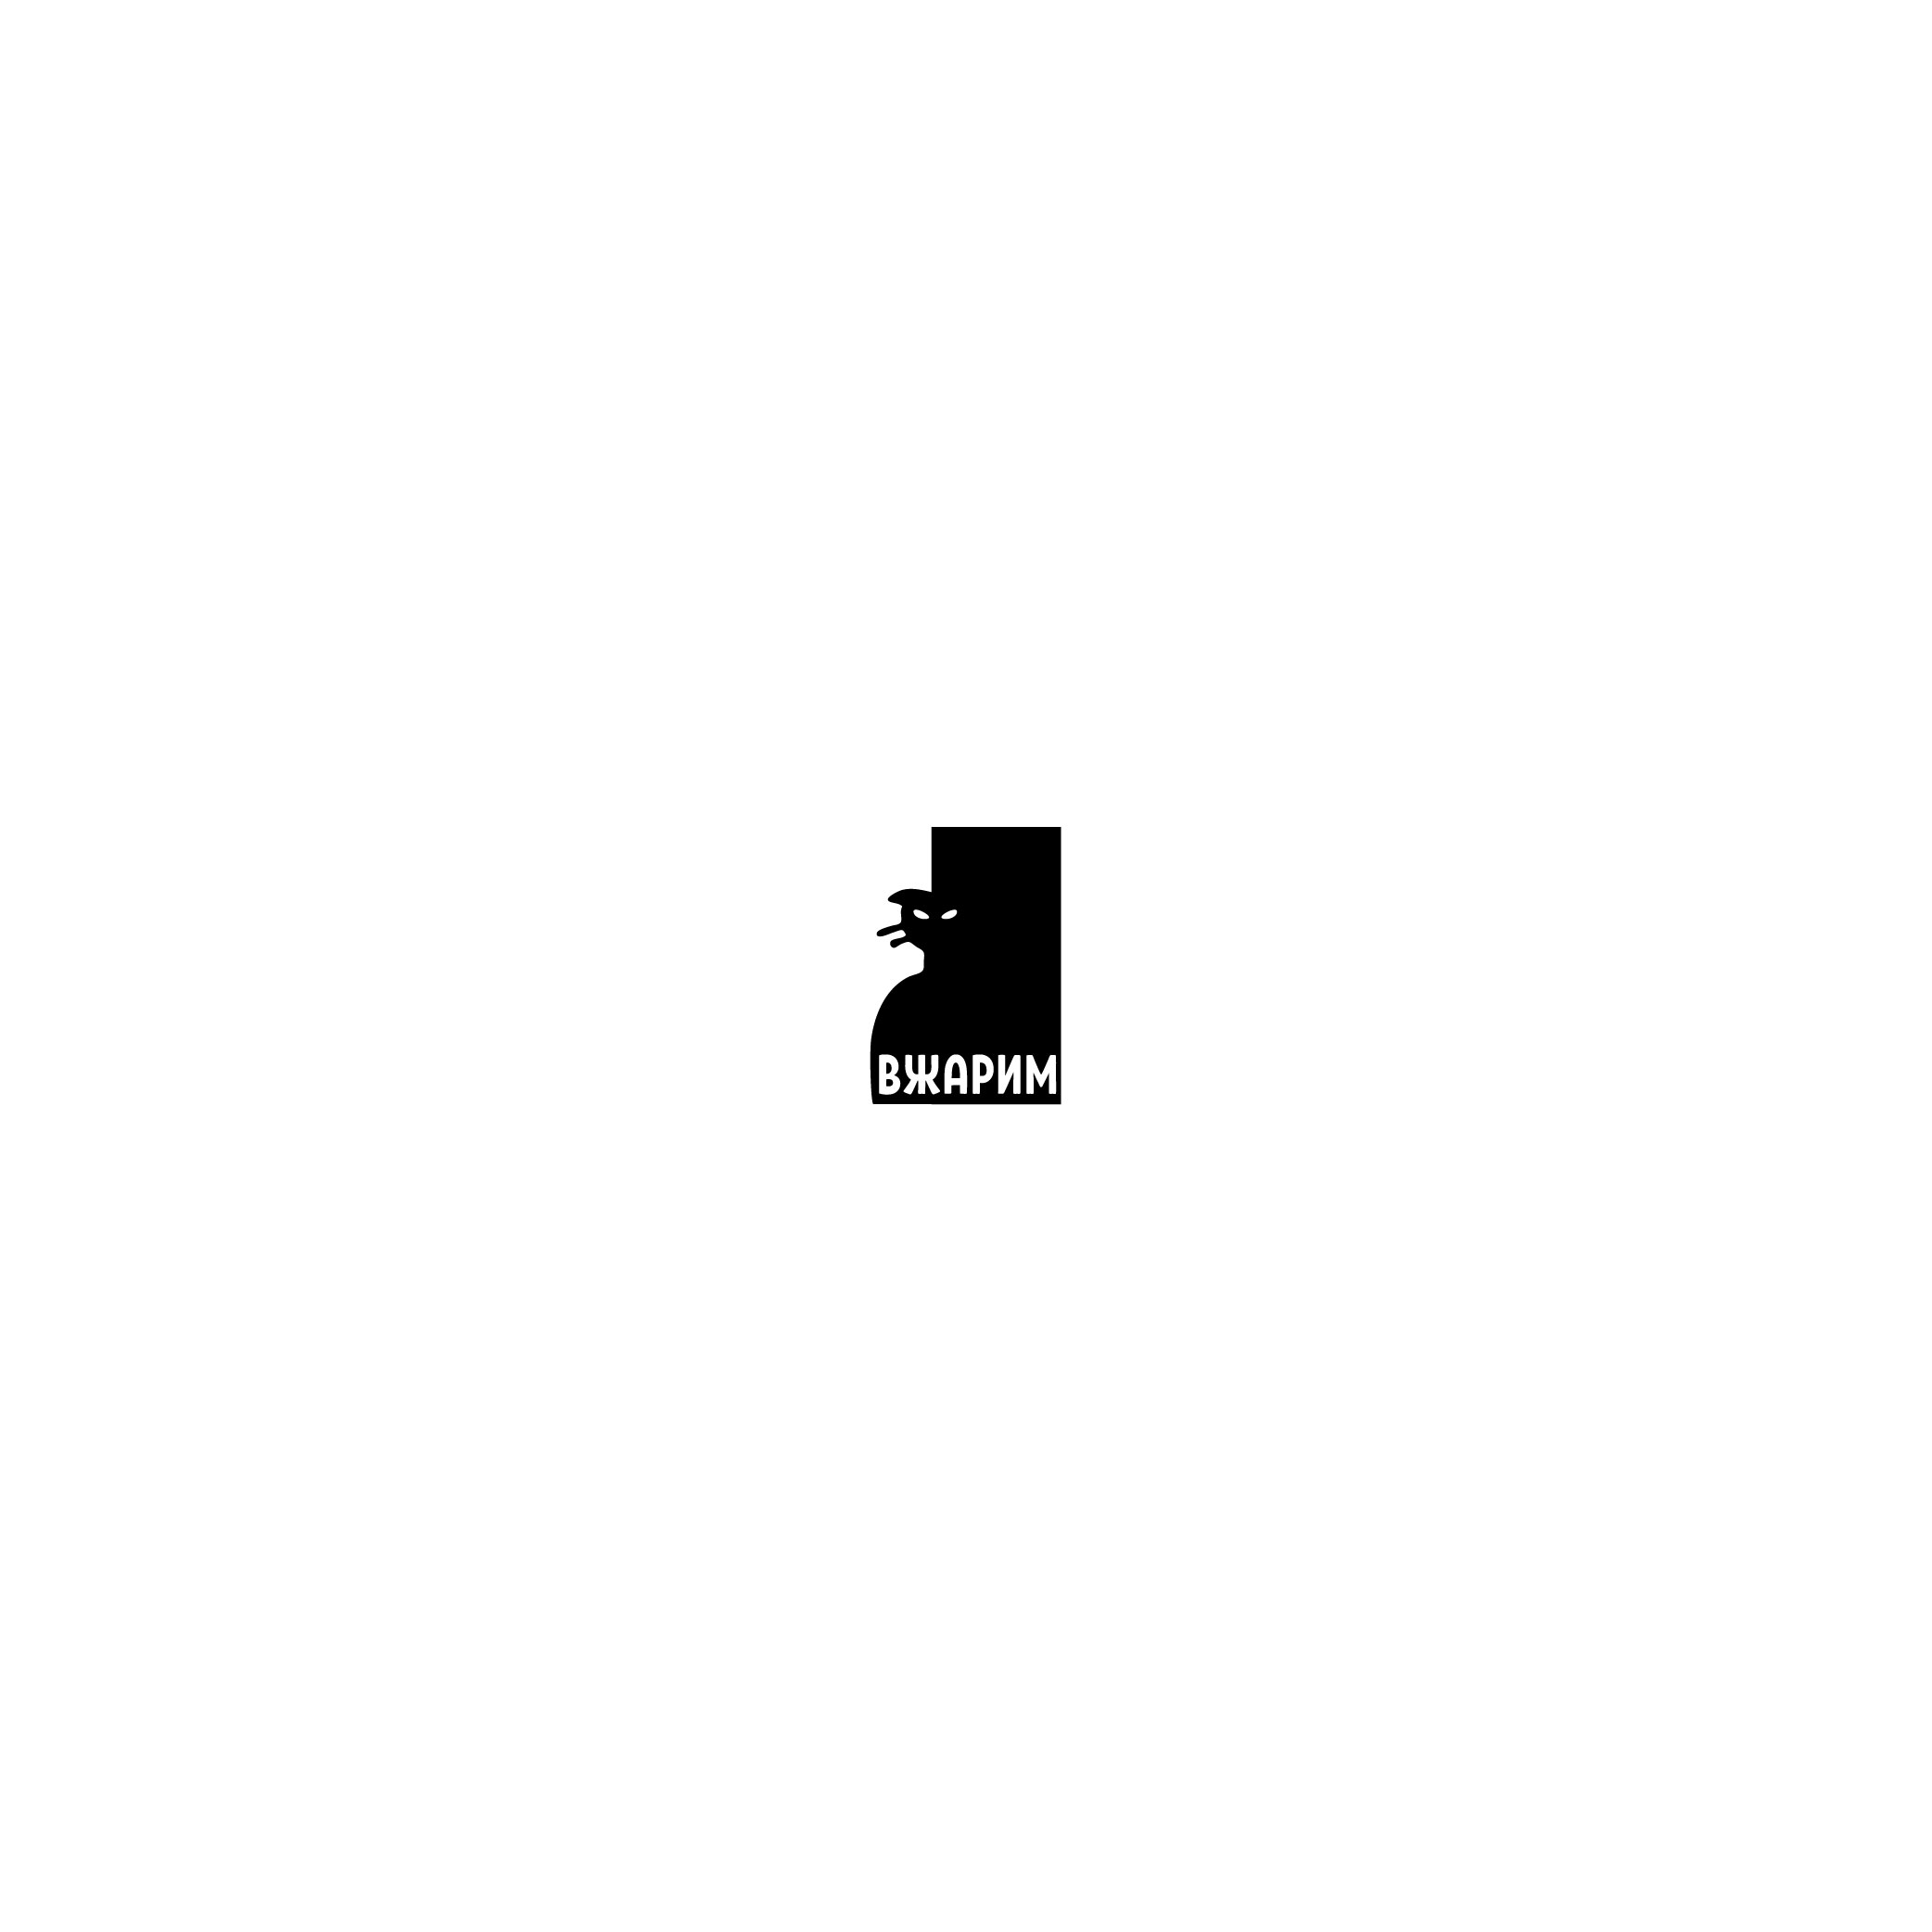 Требуется, разработка логотипа для крафт-кафе «ВЖАРИМ». фото f_61060092142e6a2d.jpg